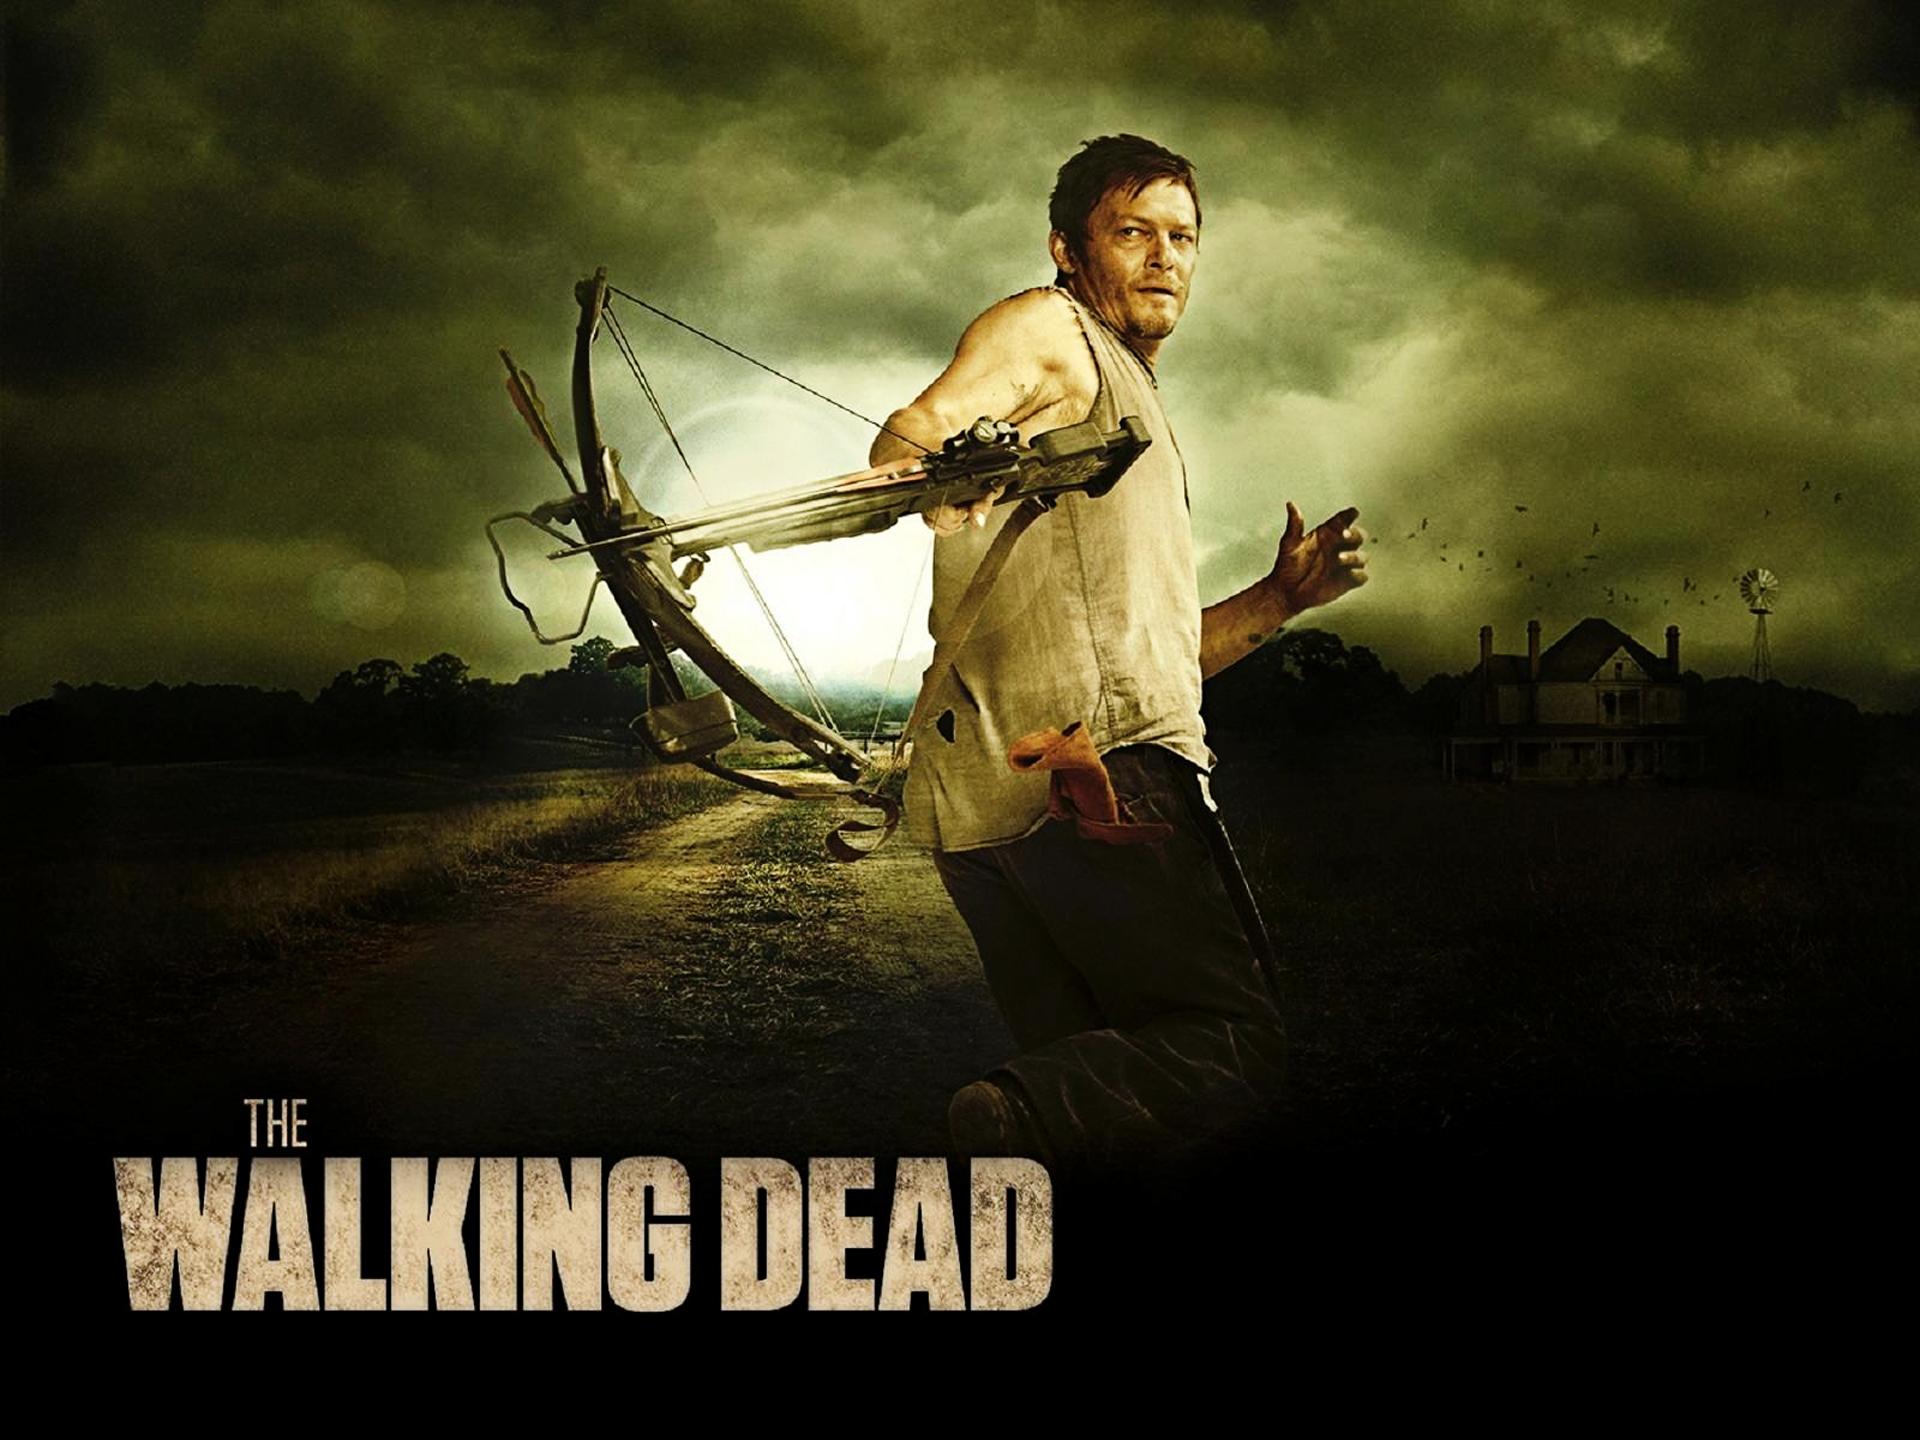 http://3.bp.blogspot.com/-jcoCScrCwLc/UOMT1U1n_EI/AAAAAAAAG5Y/6EFXTLBclfw/s2000/The-Walking-Dead-Daryl-HD-Wallpaper_Vvallpaper.Net.jpg